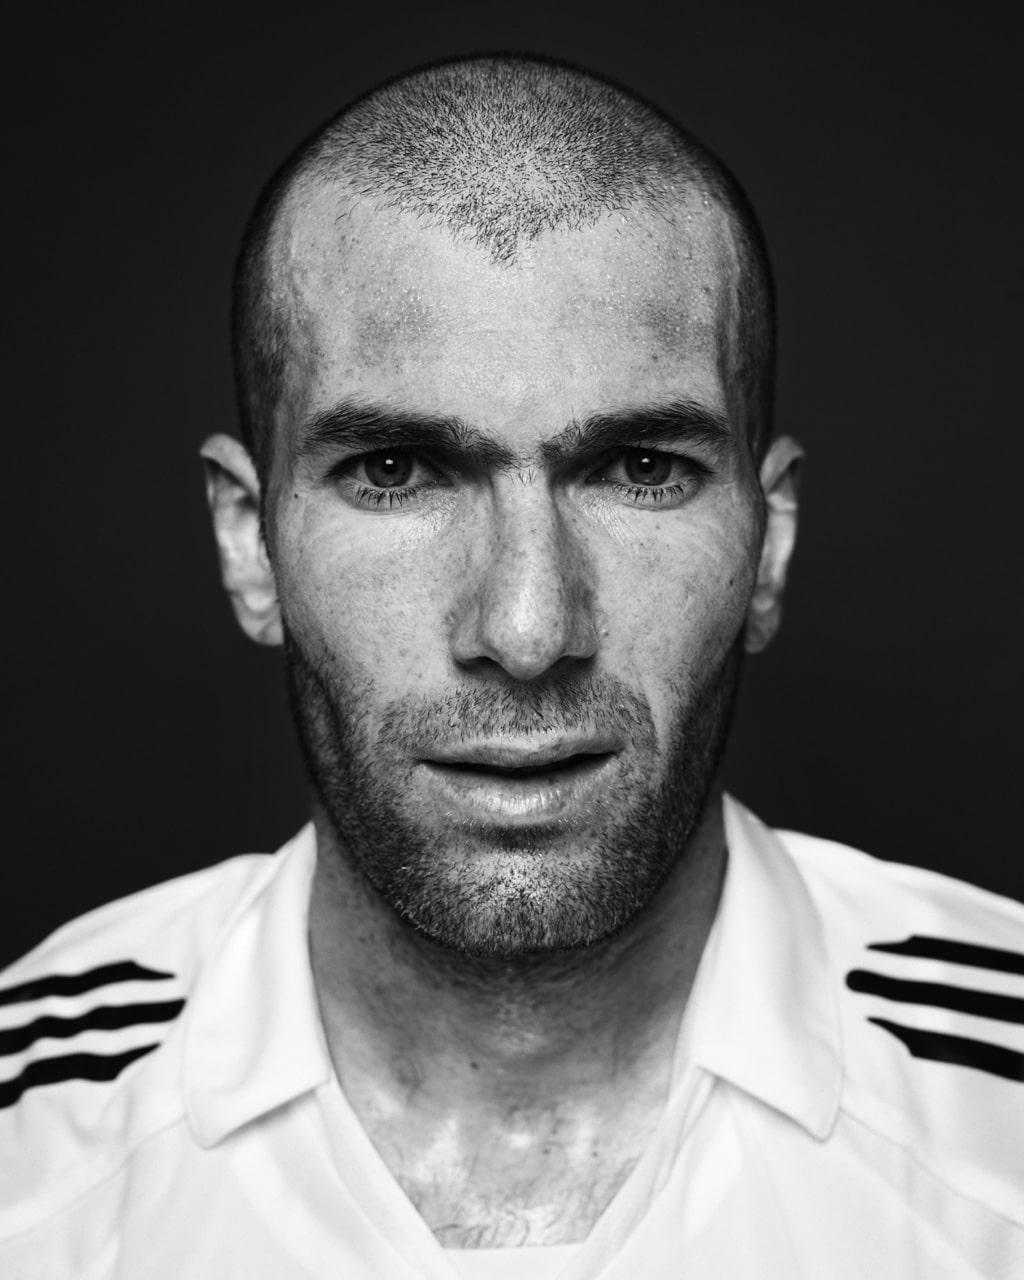 Mathias Braschler & Monika Fischer, «Faces of Football», 2005/06, Zinedine Zidane, Schwarzweiss-Fotografie auf Aluminium, 80 x 100 cm